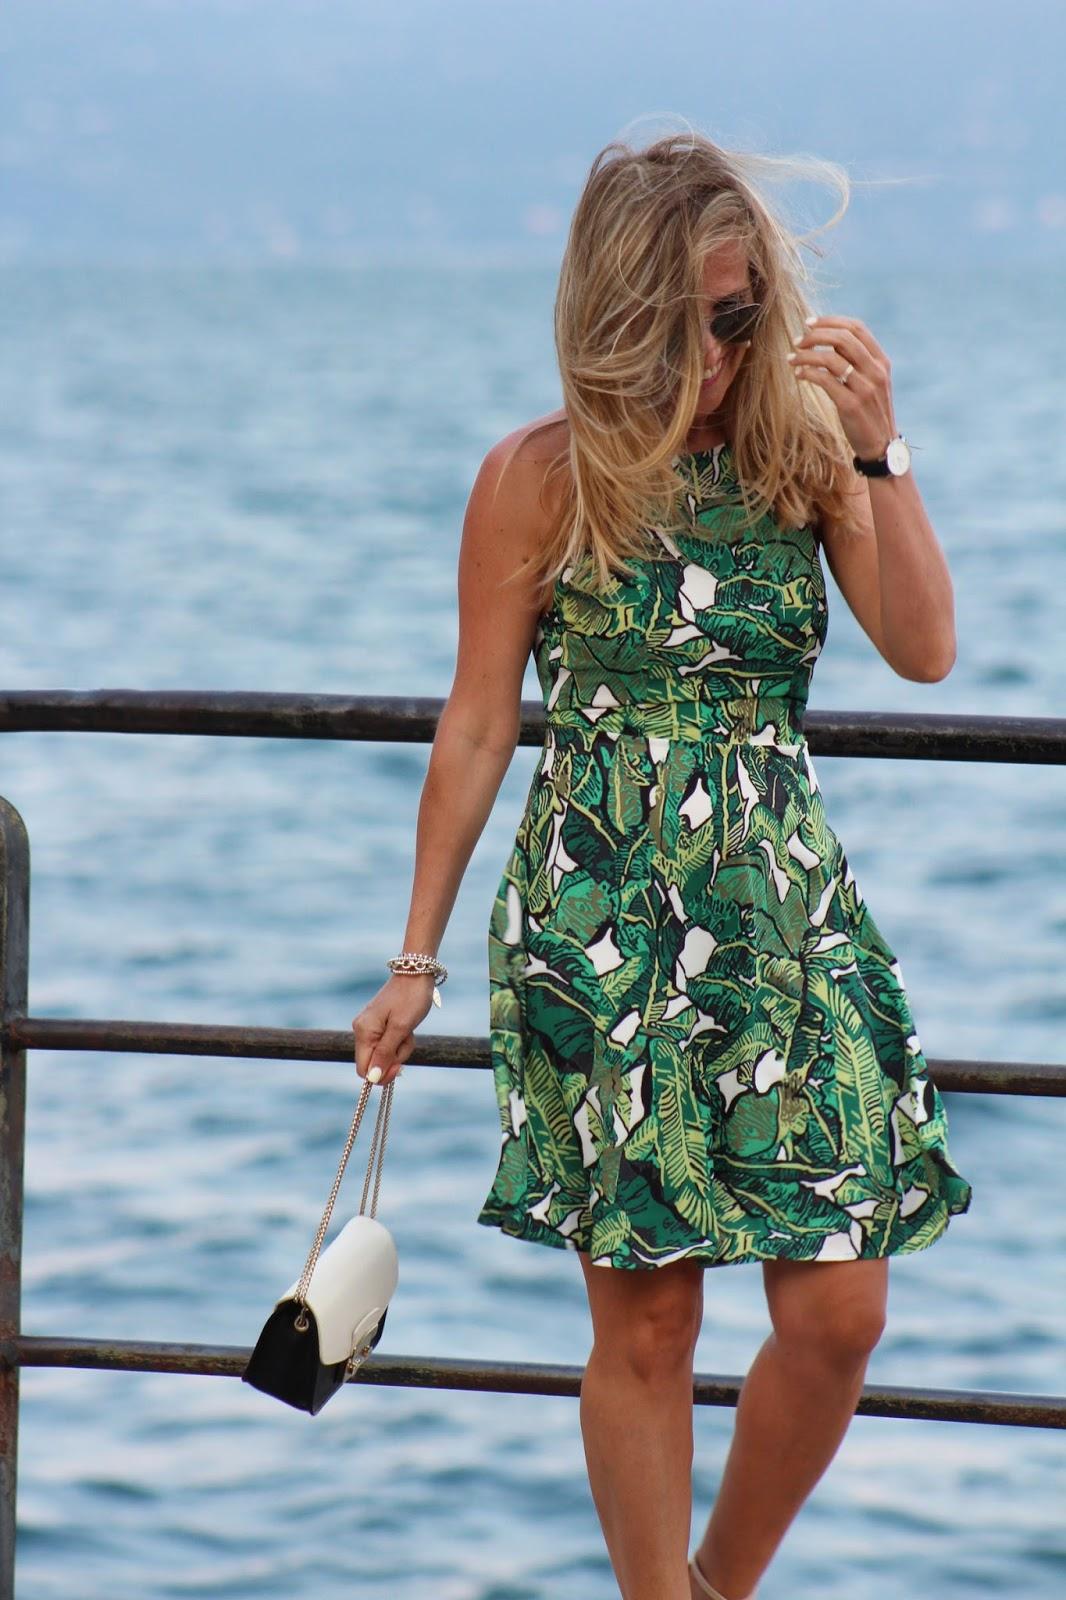 Eniwhere Fashion - SheIn Salò - Green dress